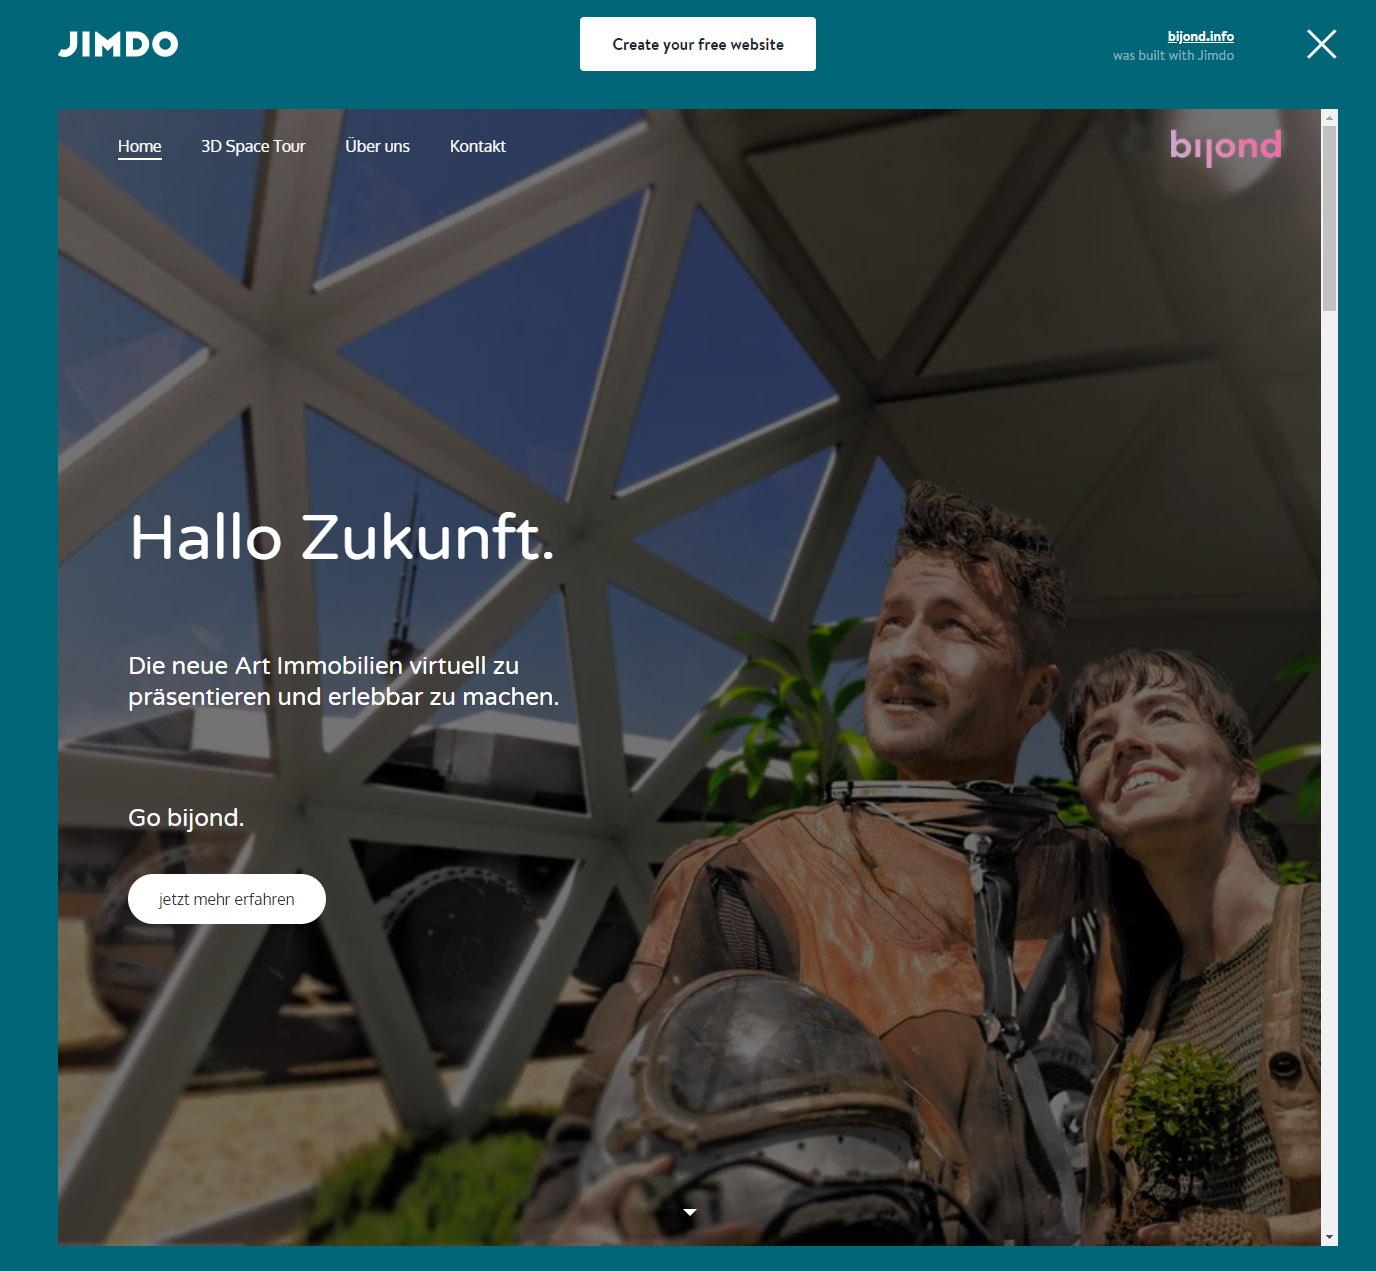 Bijond homepage